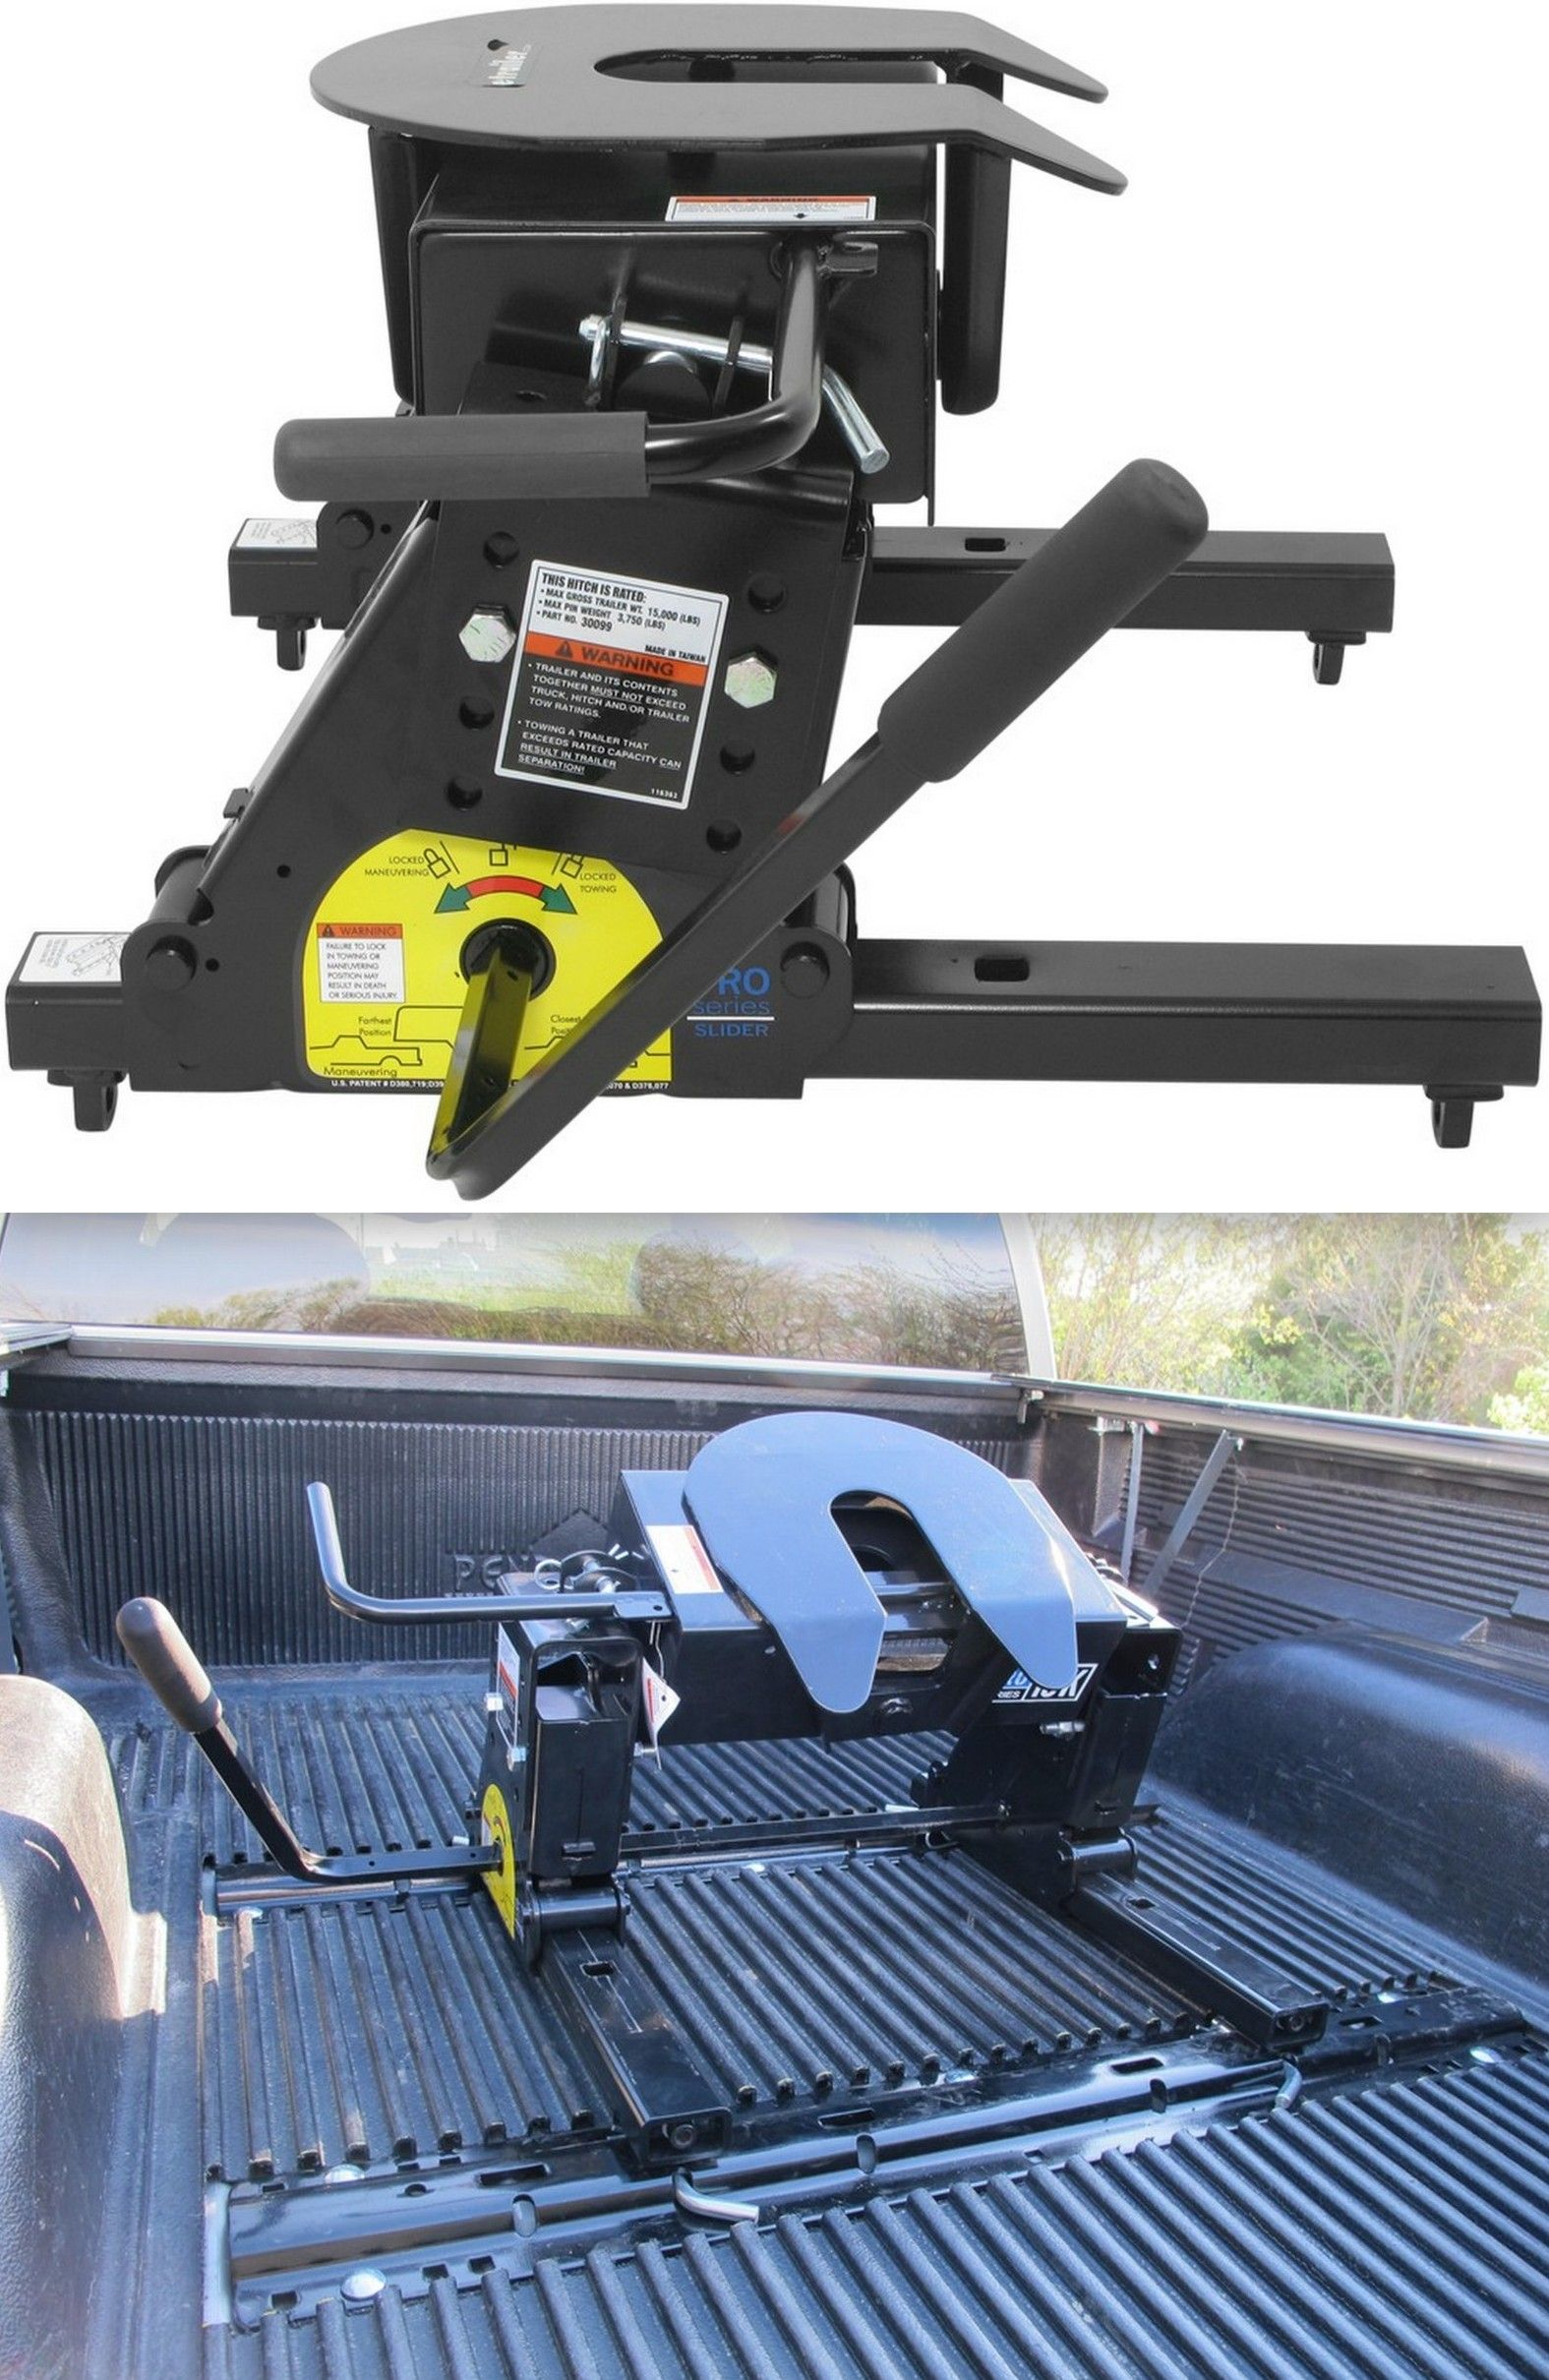 5Th Wheel Tailgate >> Pro Series 5th Wheel Trailer Hitch w/ Square Tube Slider - Slide Bar Jaw - 15,000 lbs Pro Series ...